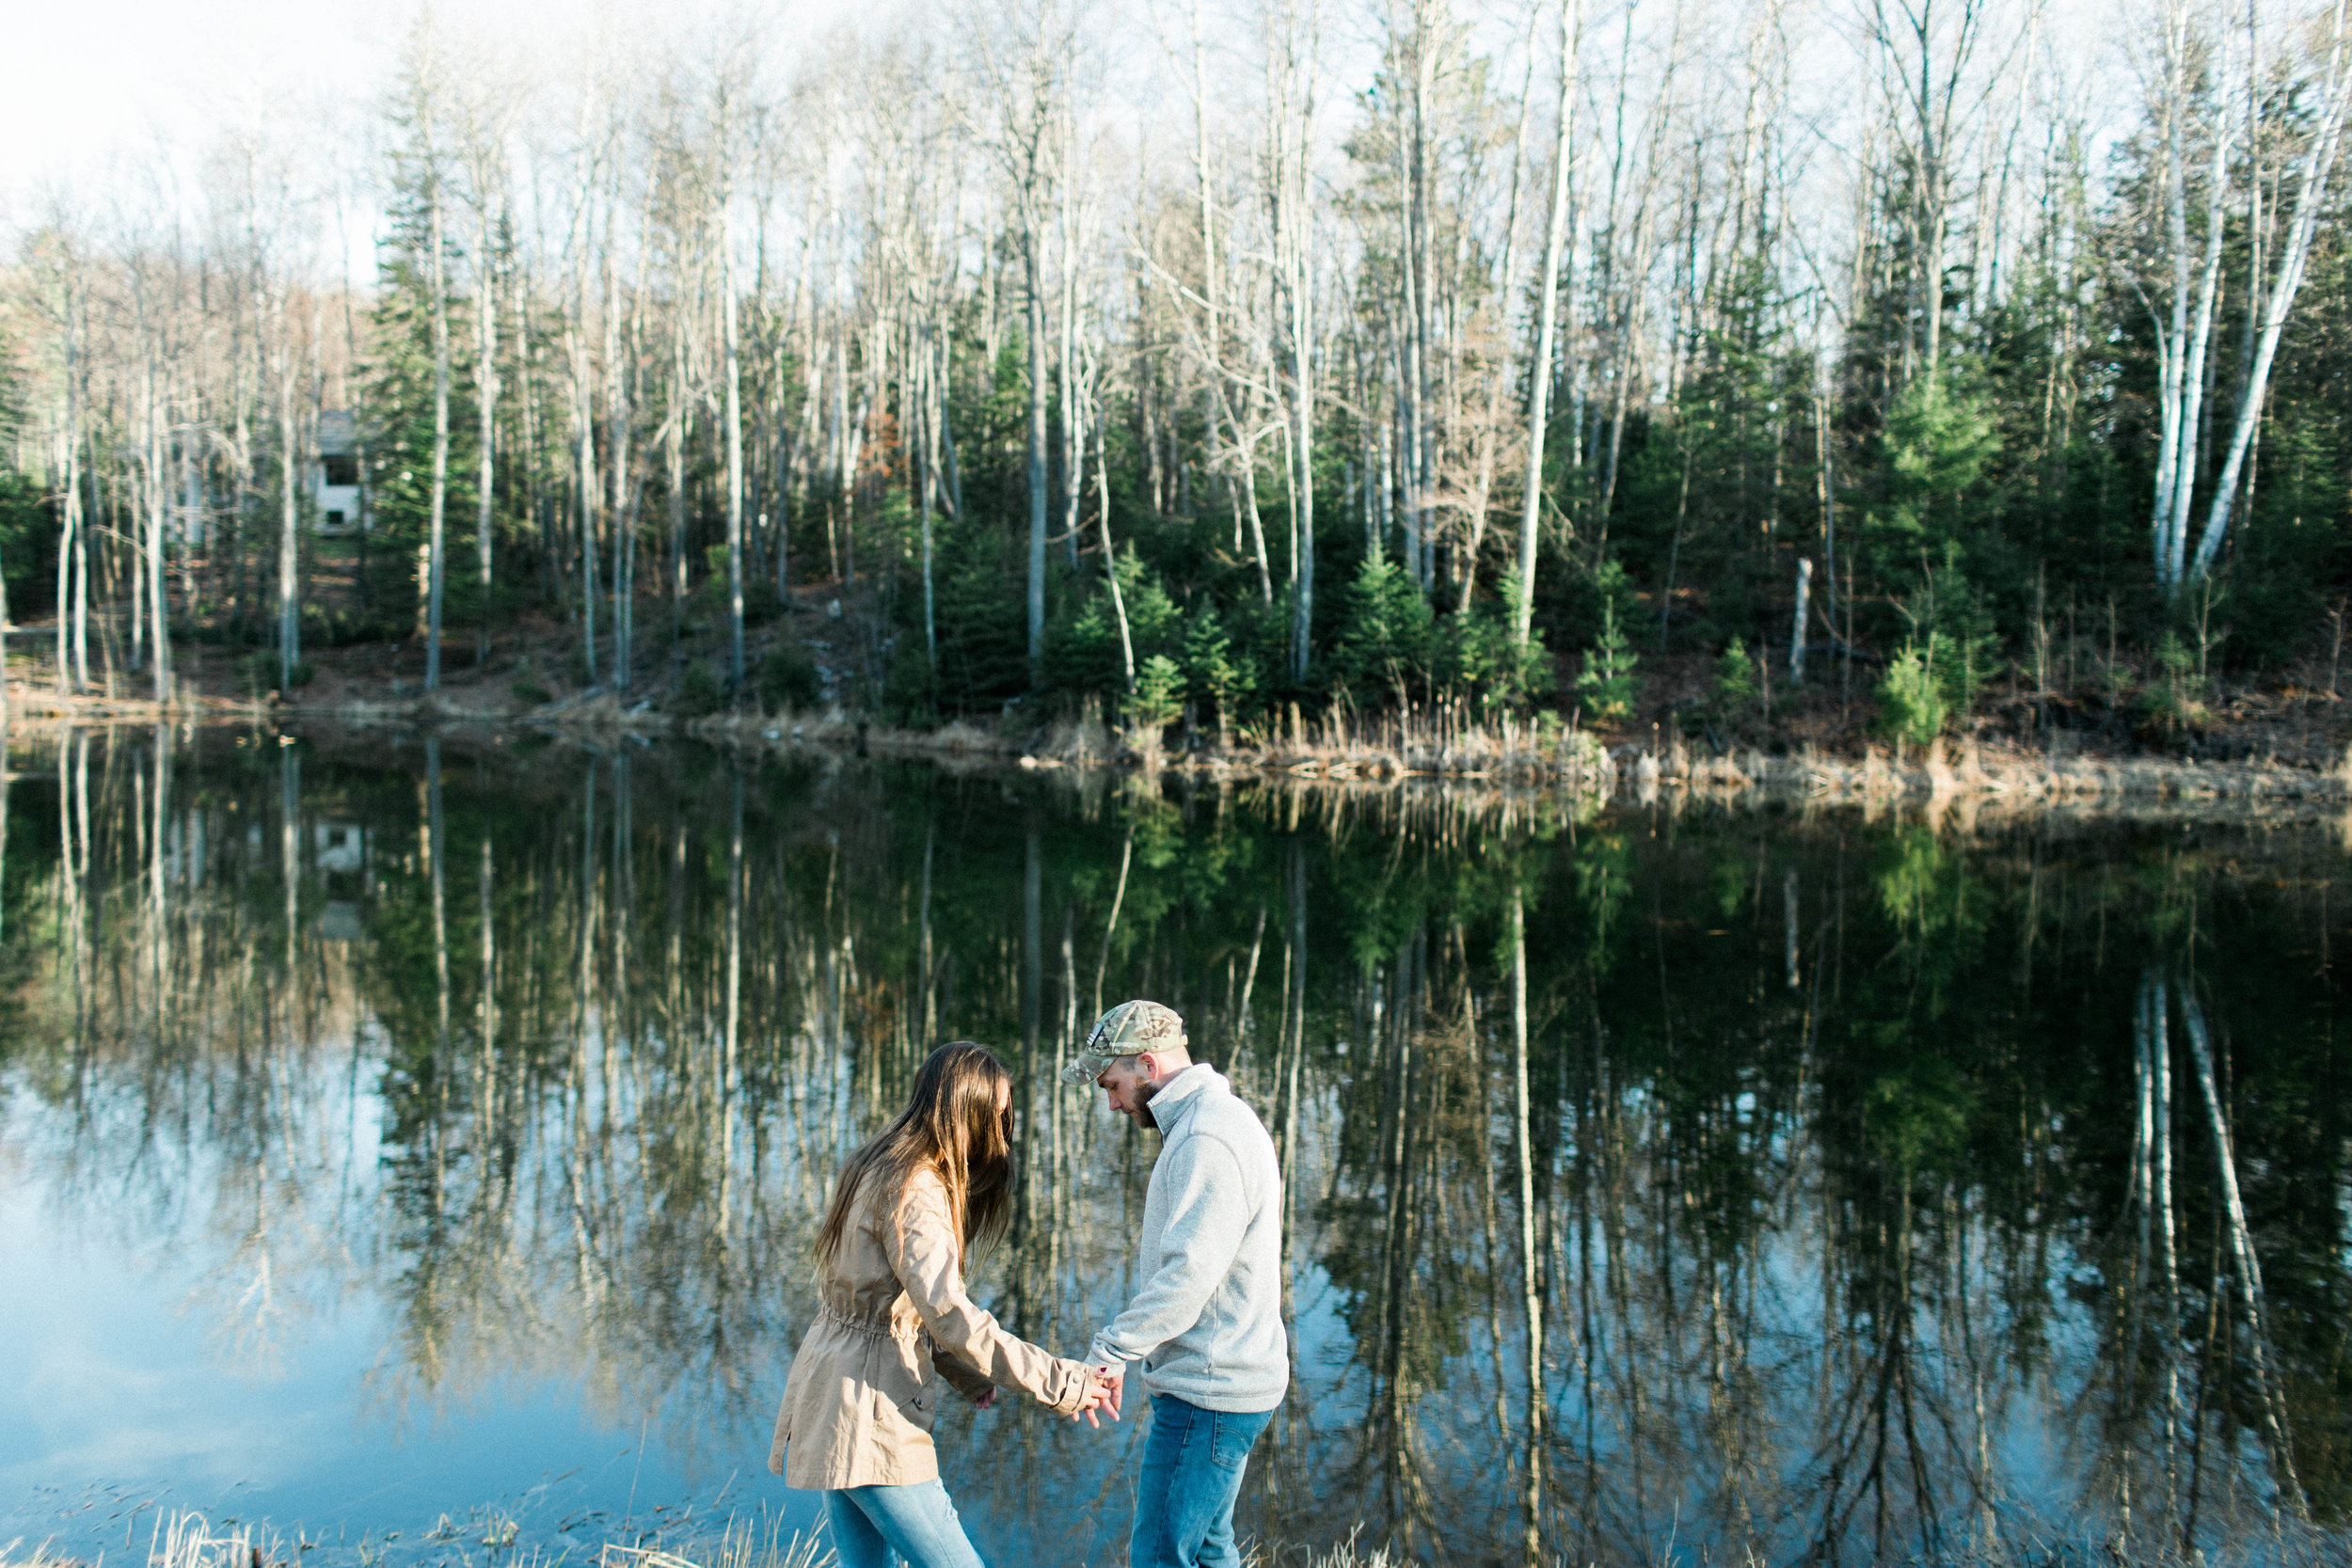 Horse Farm Engagment - Sabrina Leigh Studios - Northern Michigan Wedding Photographer 32.jpg